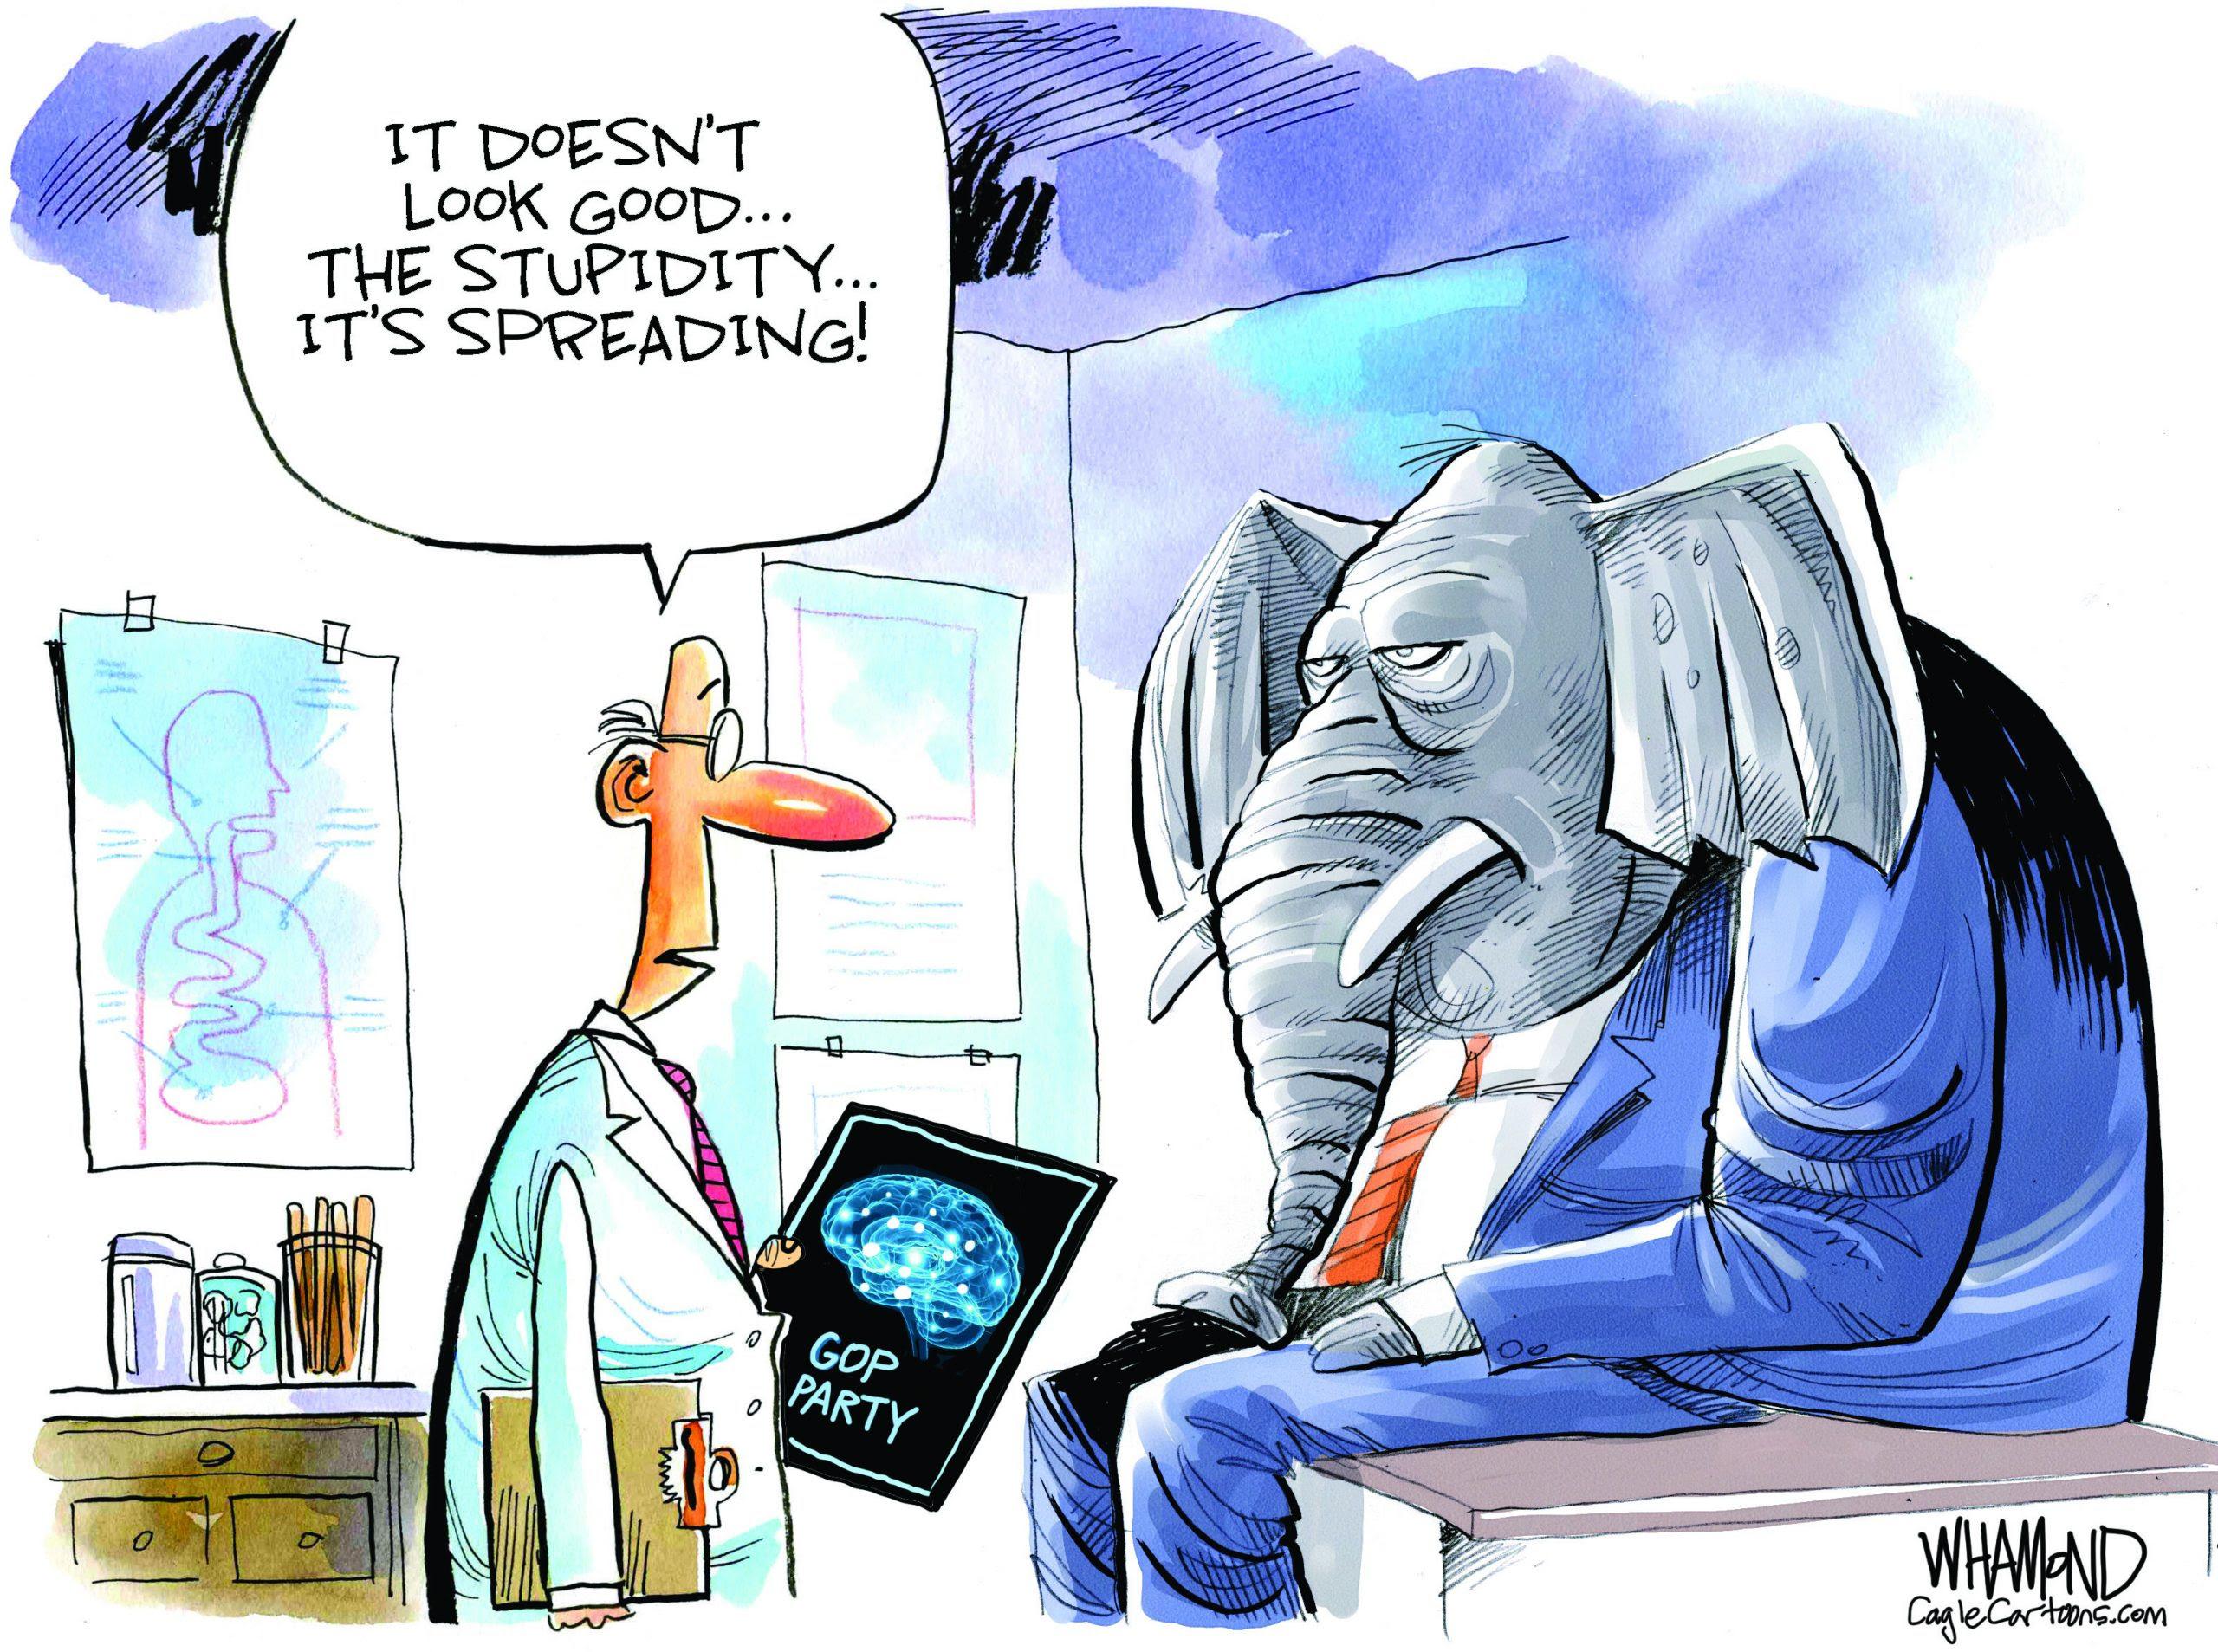 GOP Stupidity. Dave Whamond.